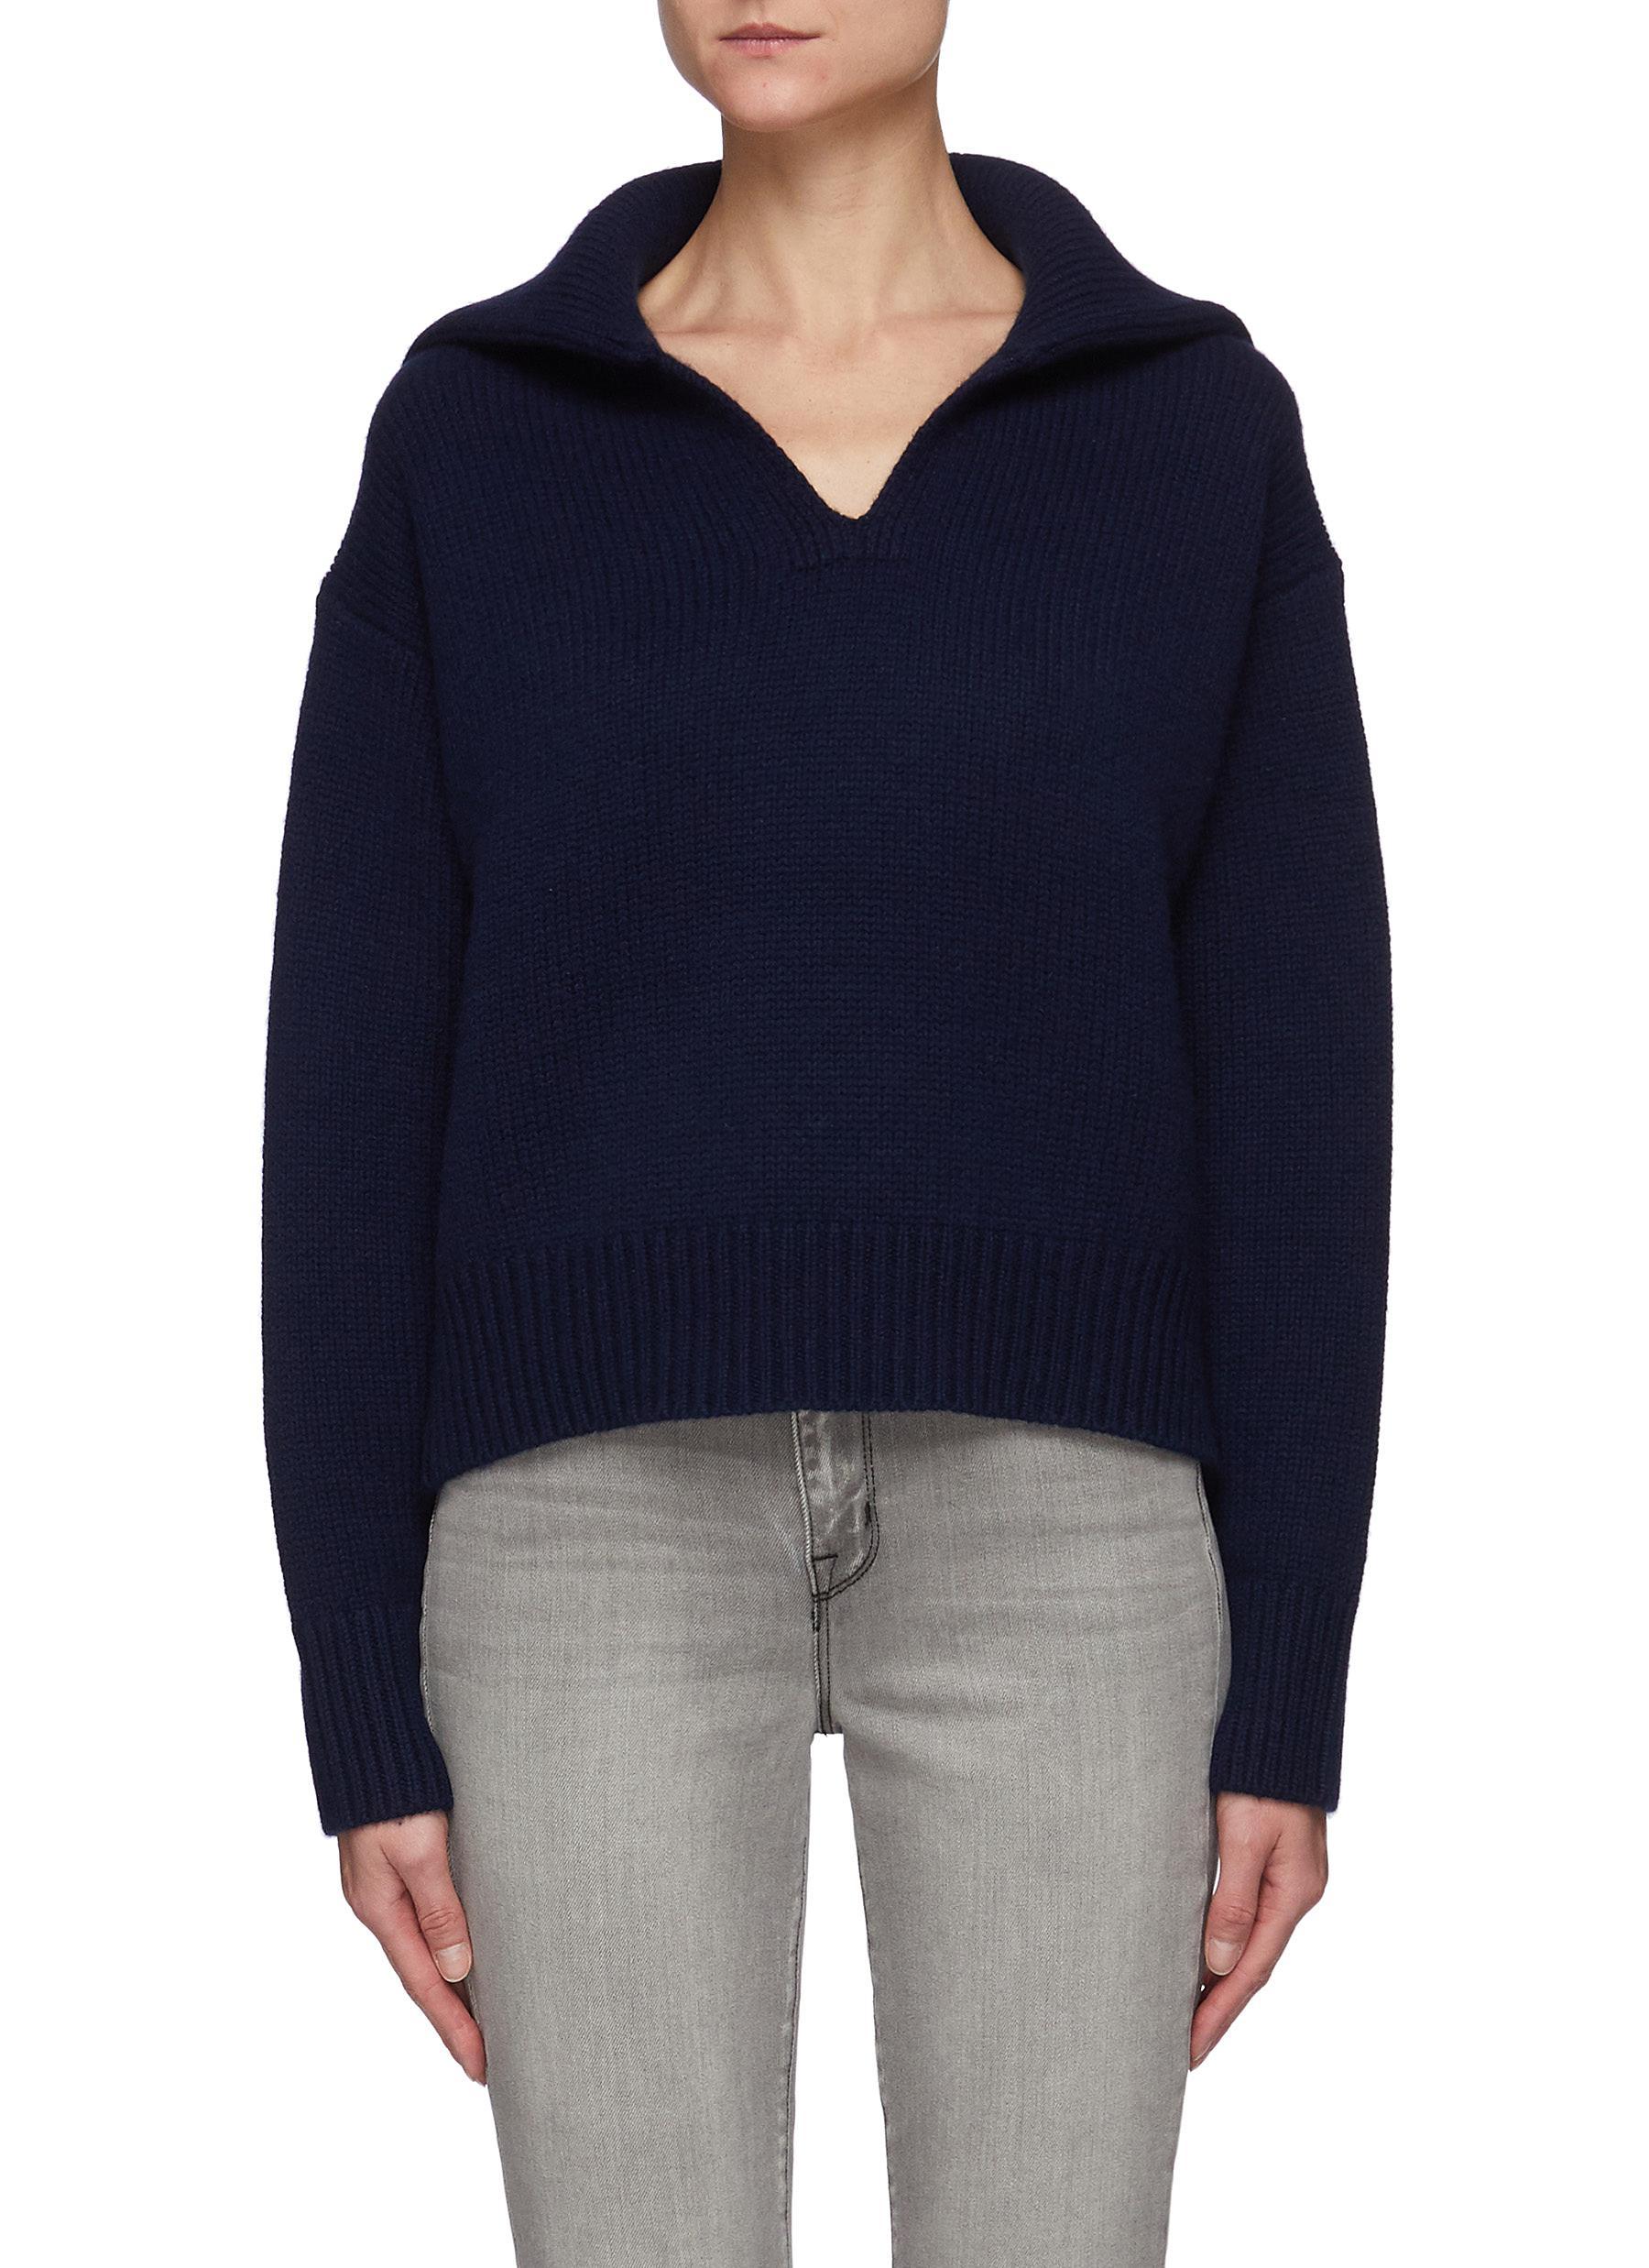 Sailor Collar Cashmere Wool Blend Knit Sweater